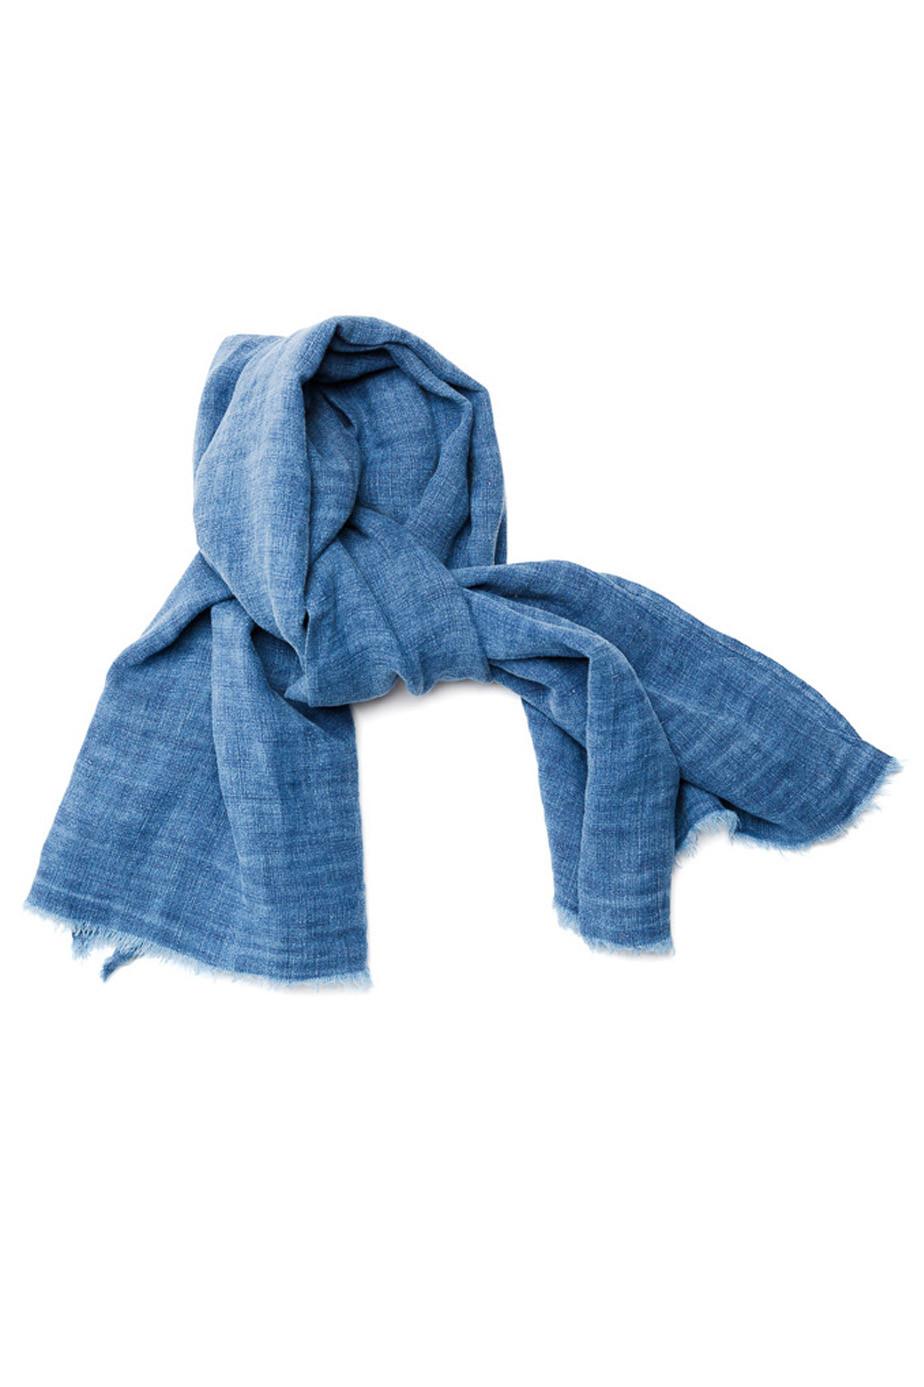 blluemade-indigo-scarf-3.jpg